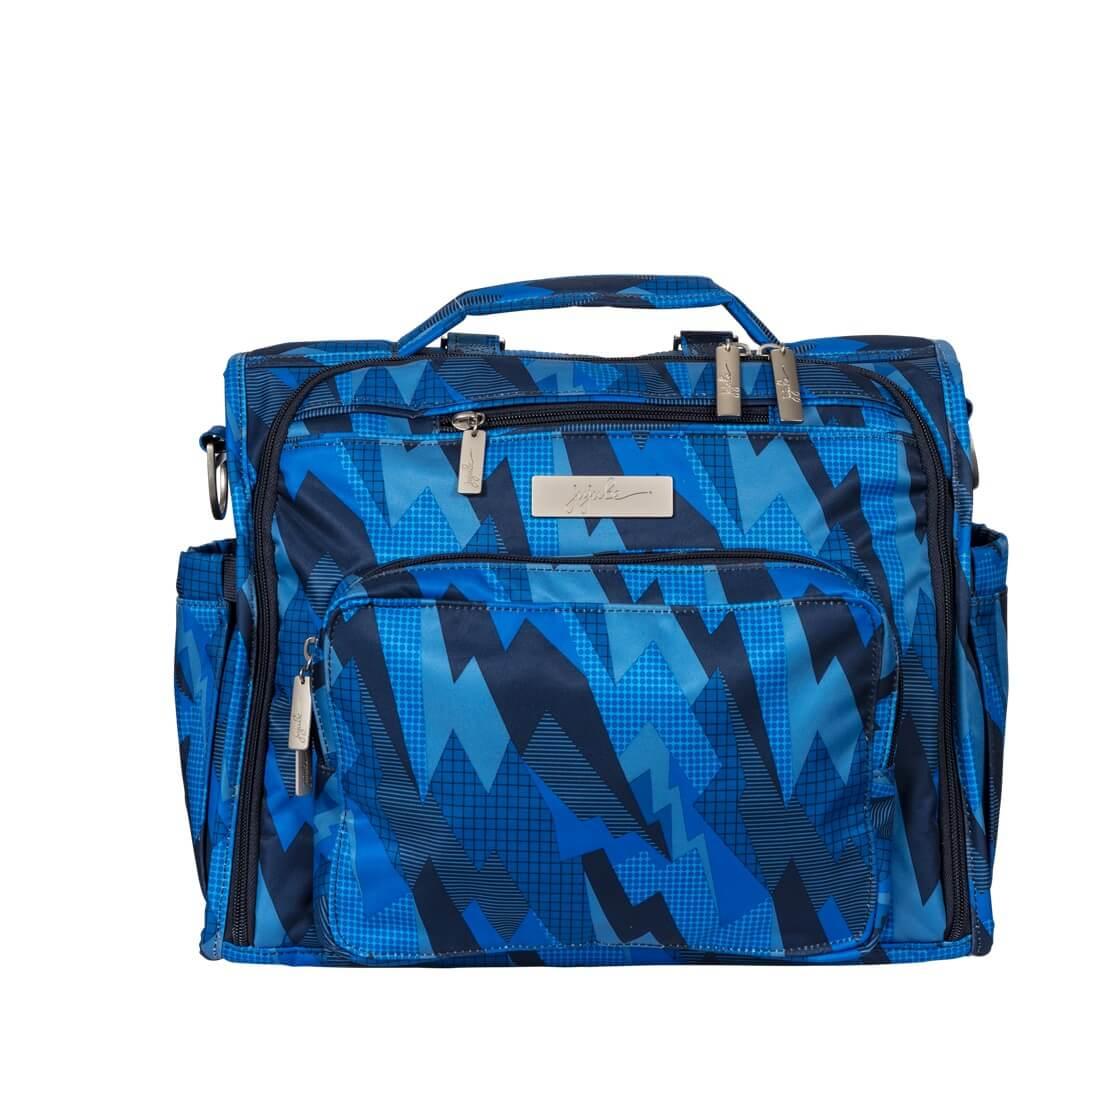 Ju Be Bff Diaper Bag Blue Steel